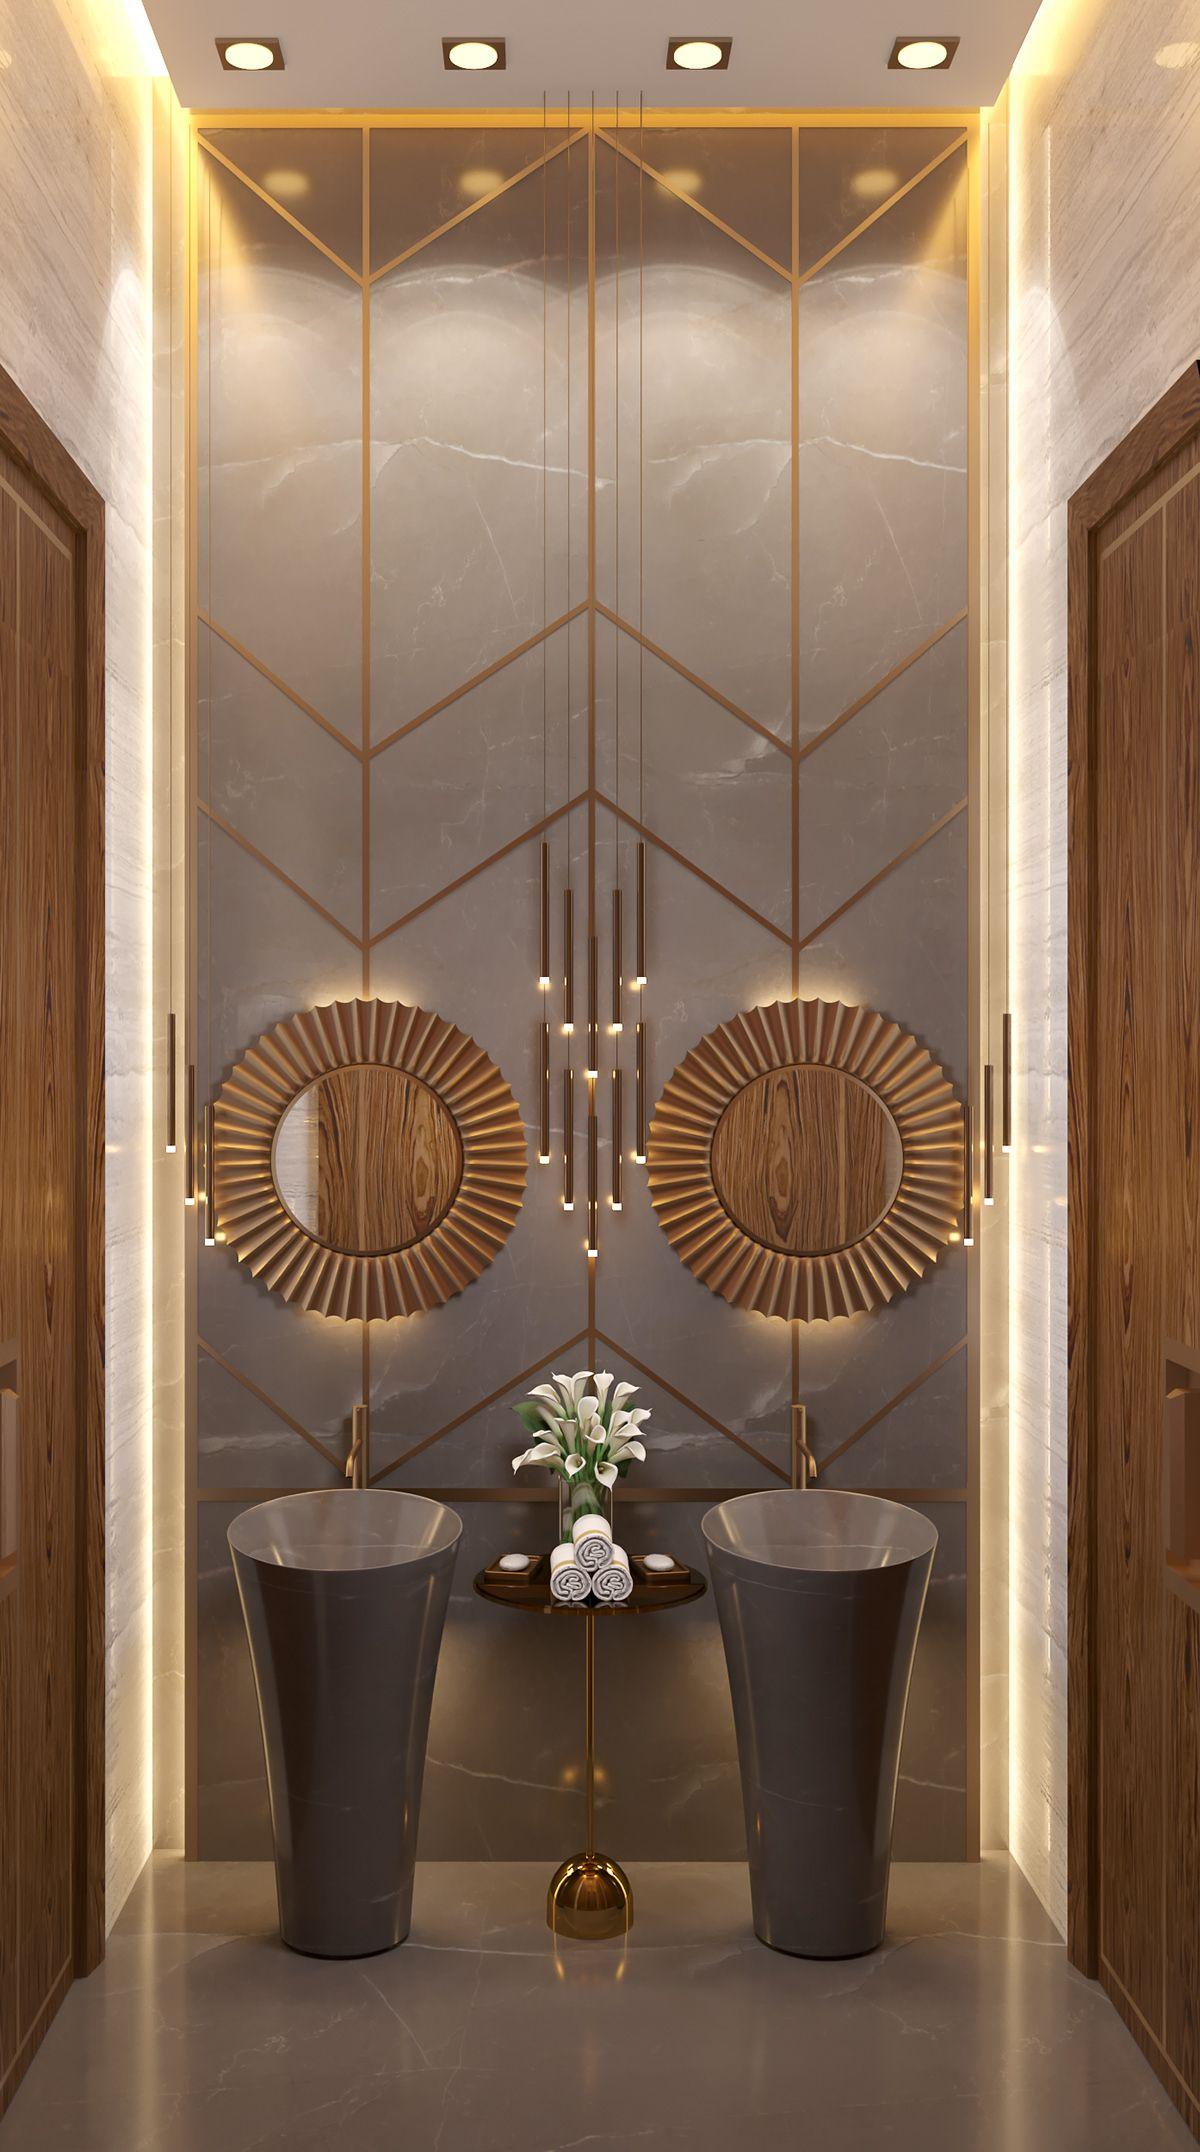 Luxury Toilet Design In Palace On Behance Toilet Luxurydesign Luxurytoilet Grey Marble Gold Luxury Toilet Bathroom Design Luxury Toilet Design